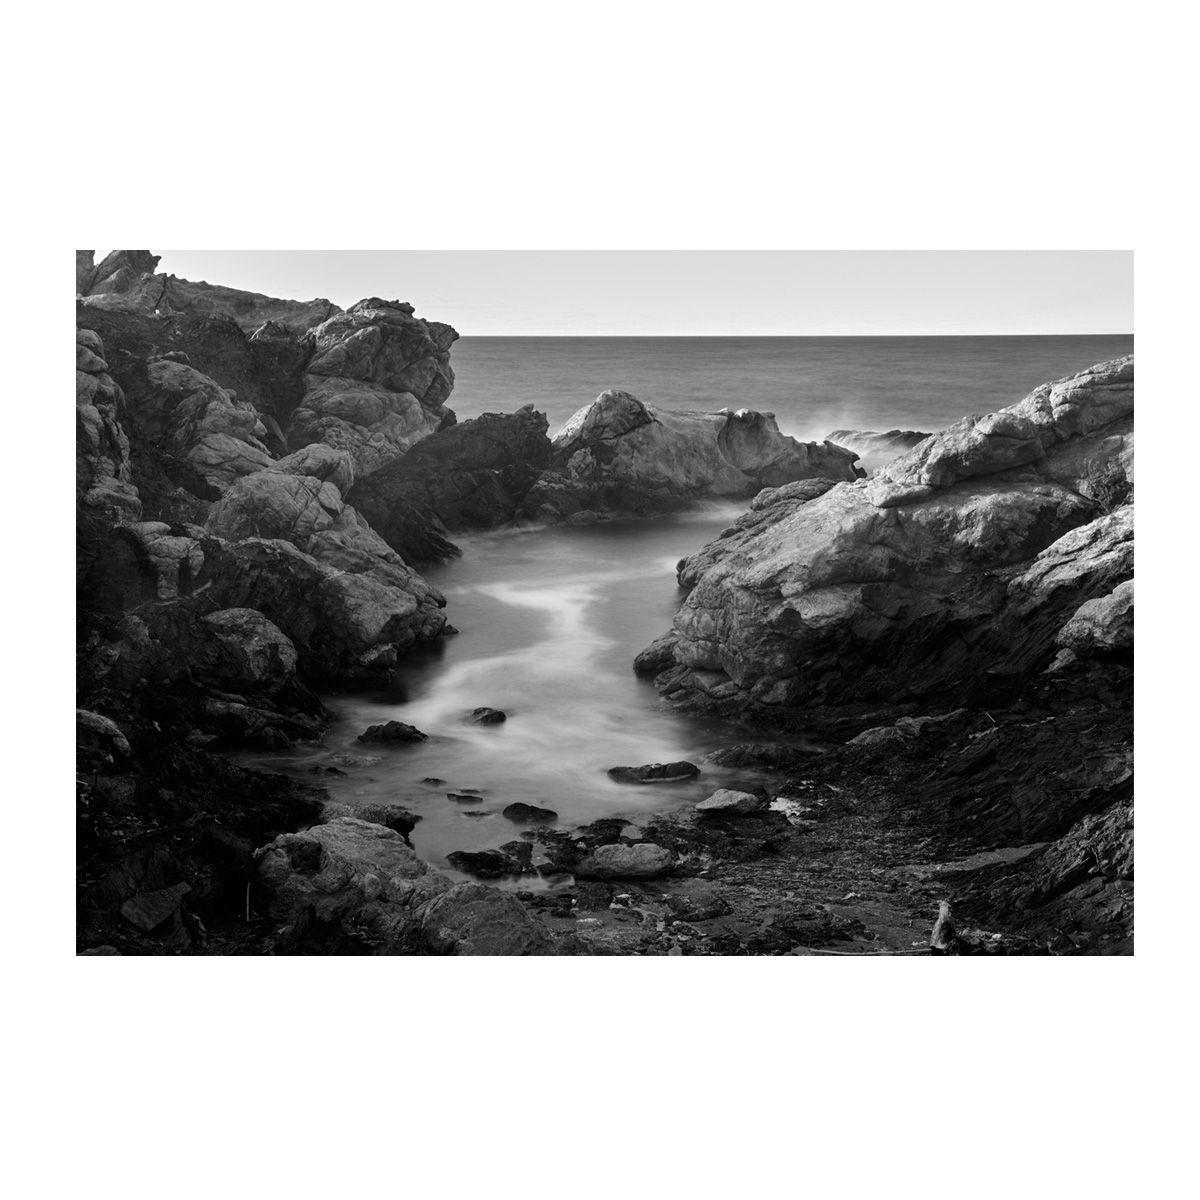 sarabiaphoto-cap-de-creus-21-web